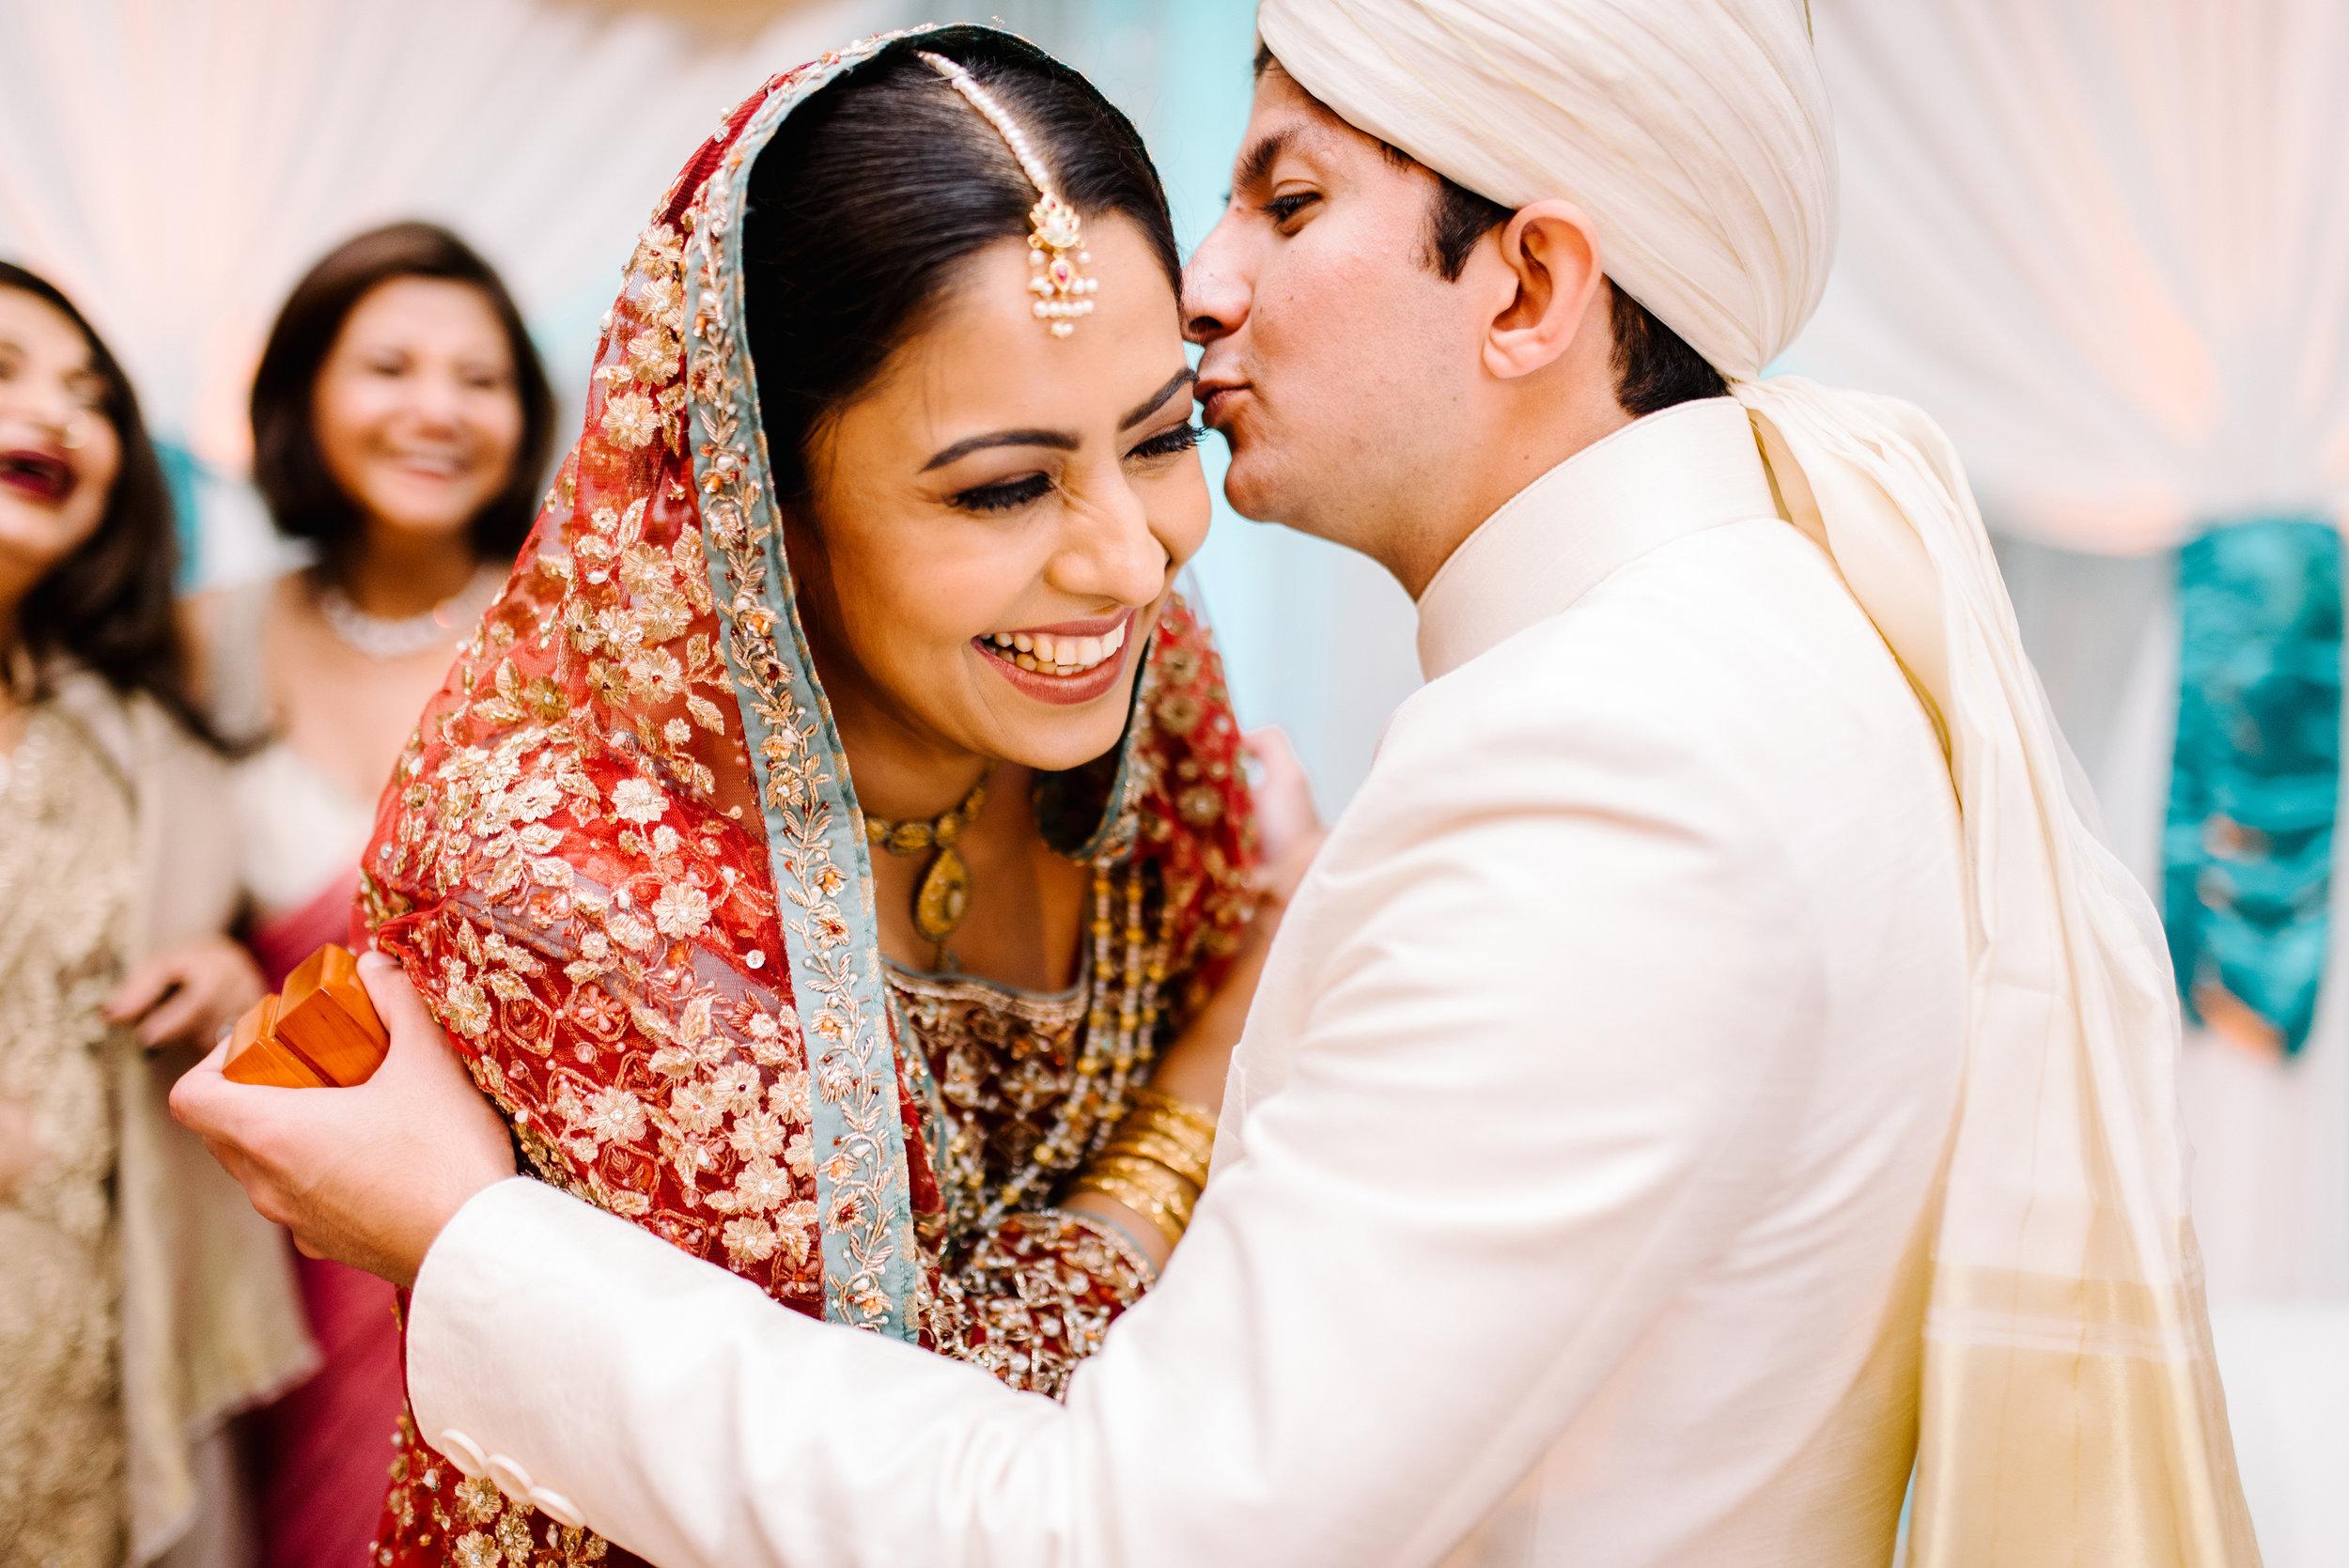 PakistaniMichiganwedding.jpg